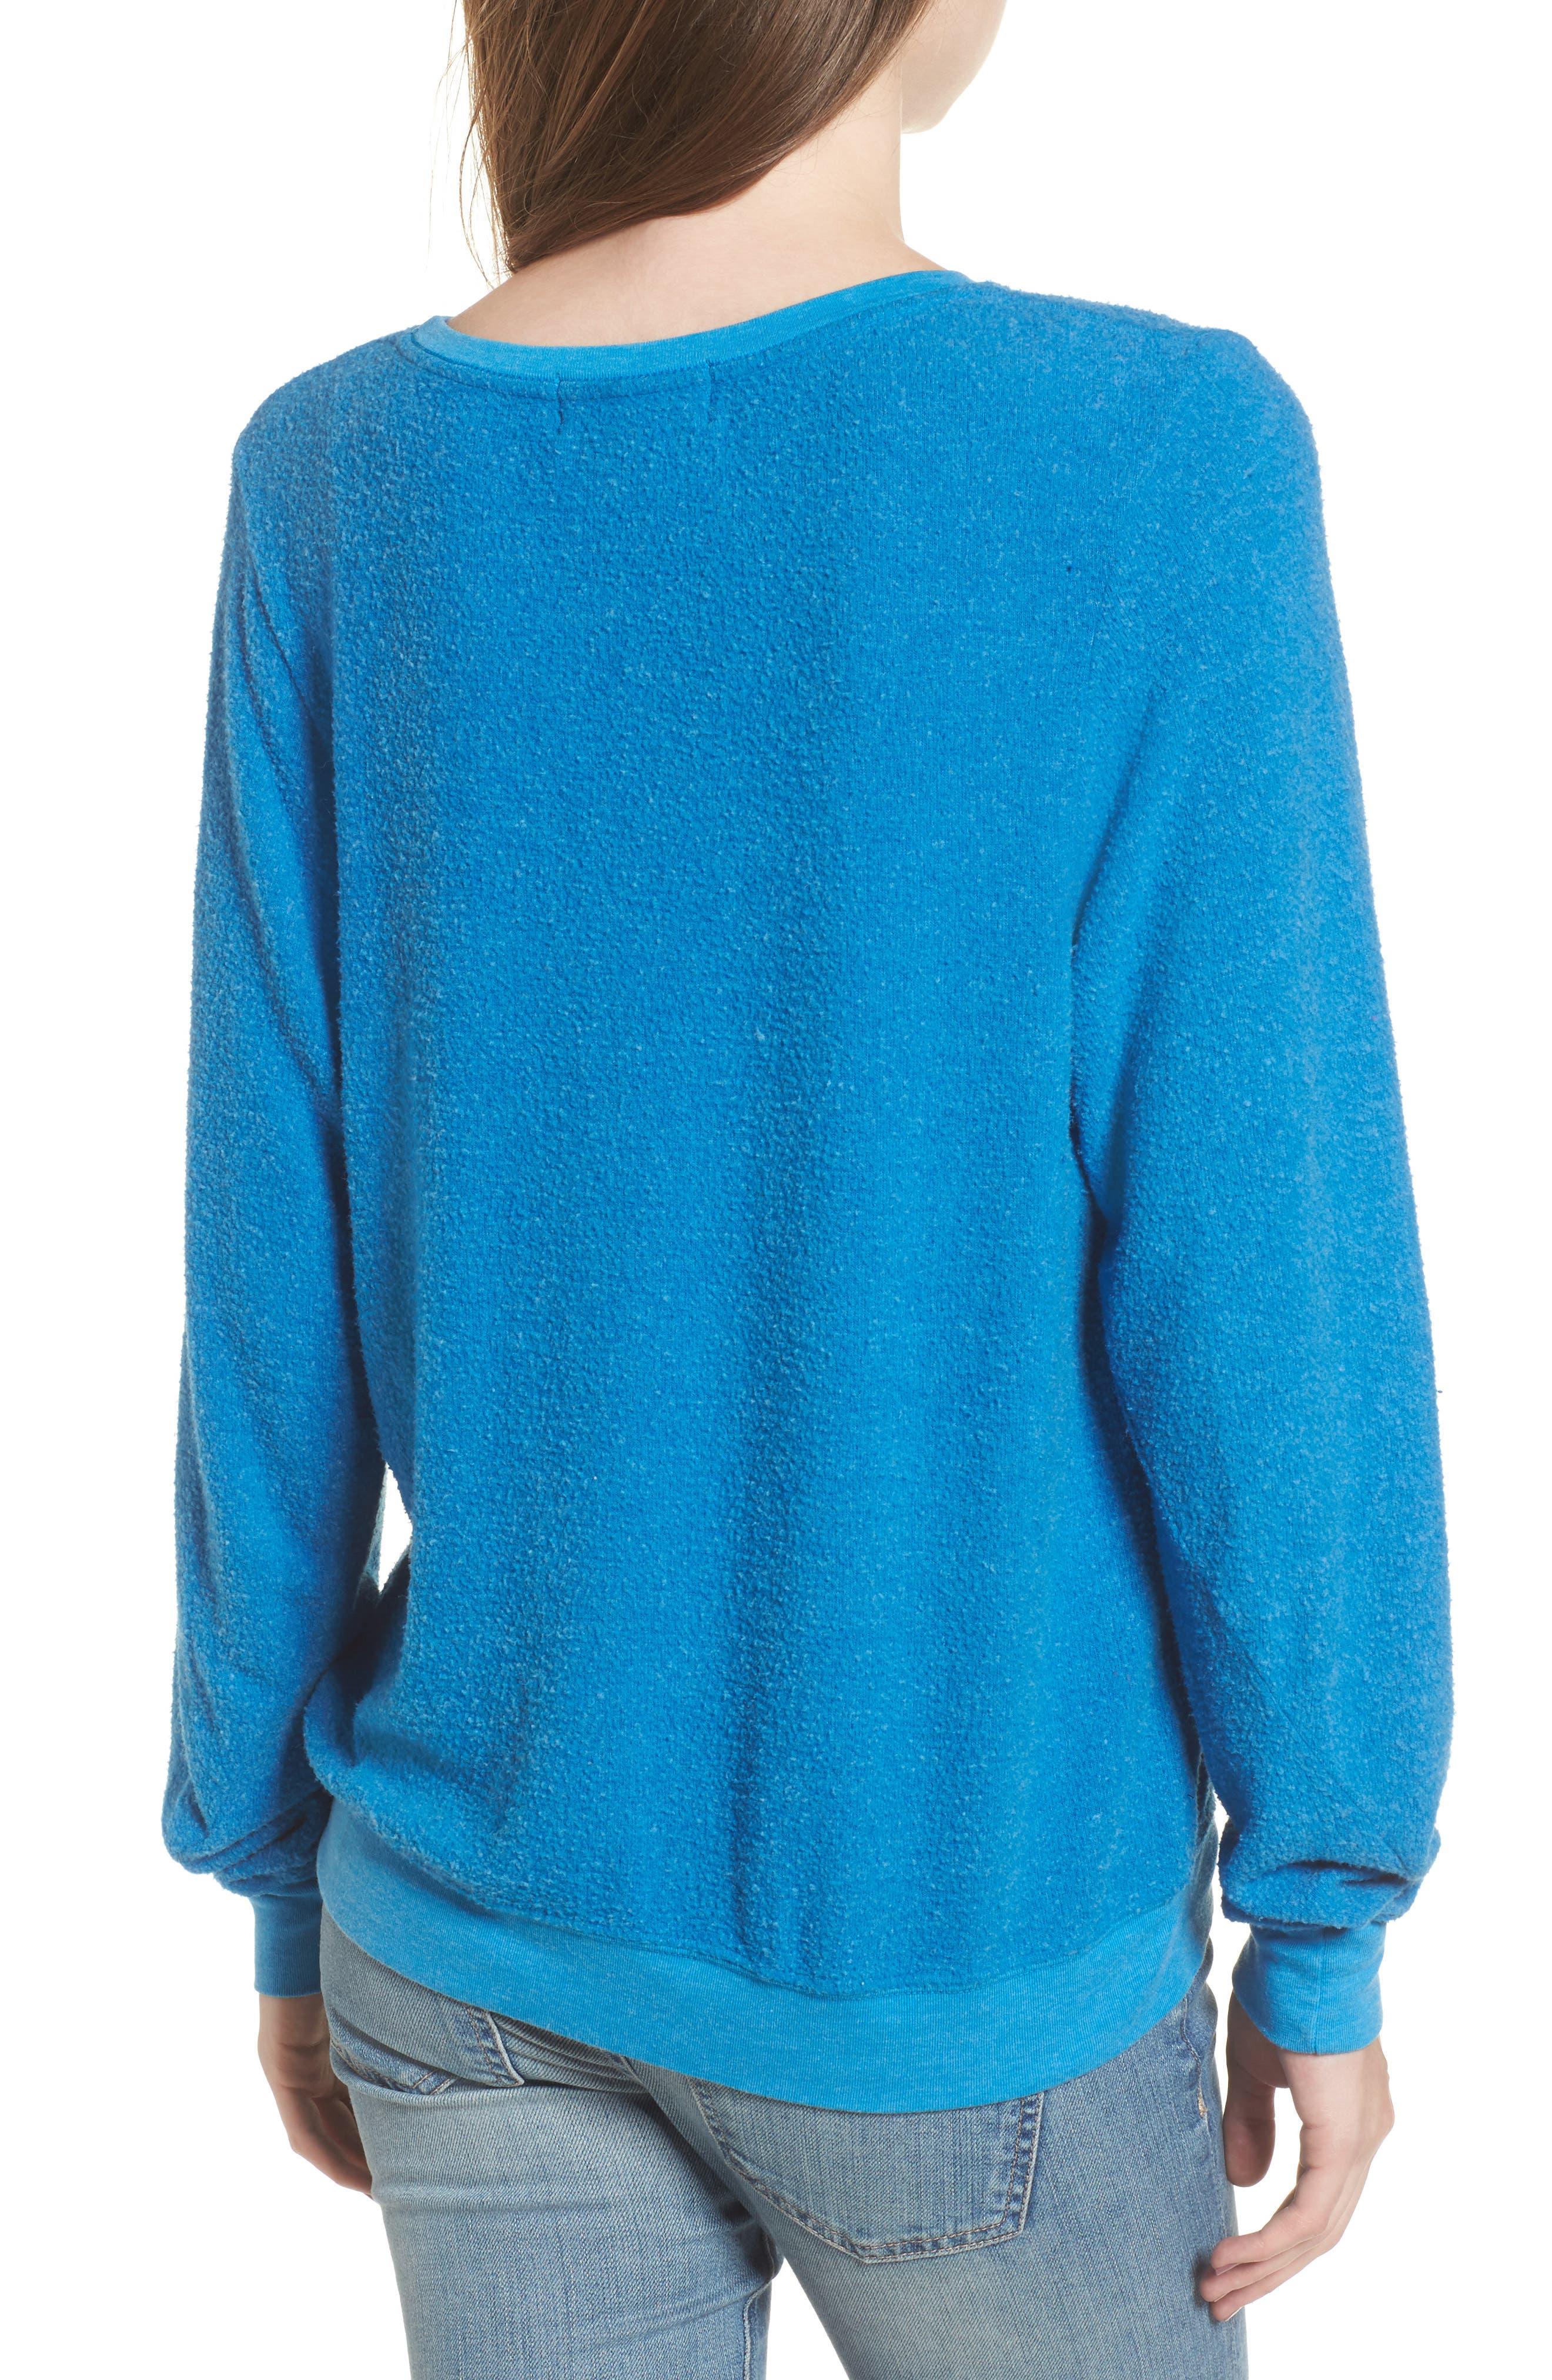 Owl Love You Forever Sweatshirt,                             Alternate thumbnail 2, color,                             Cobalt Sea